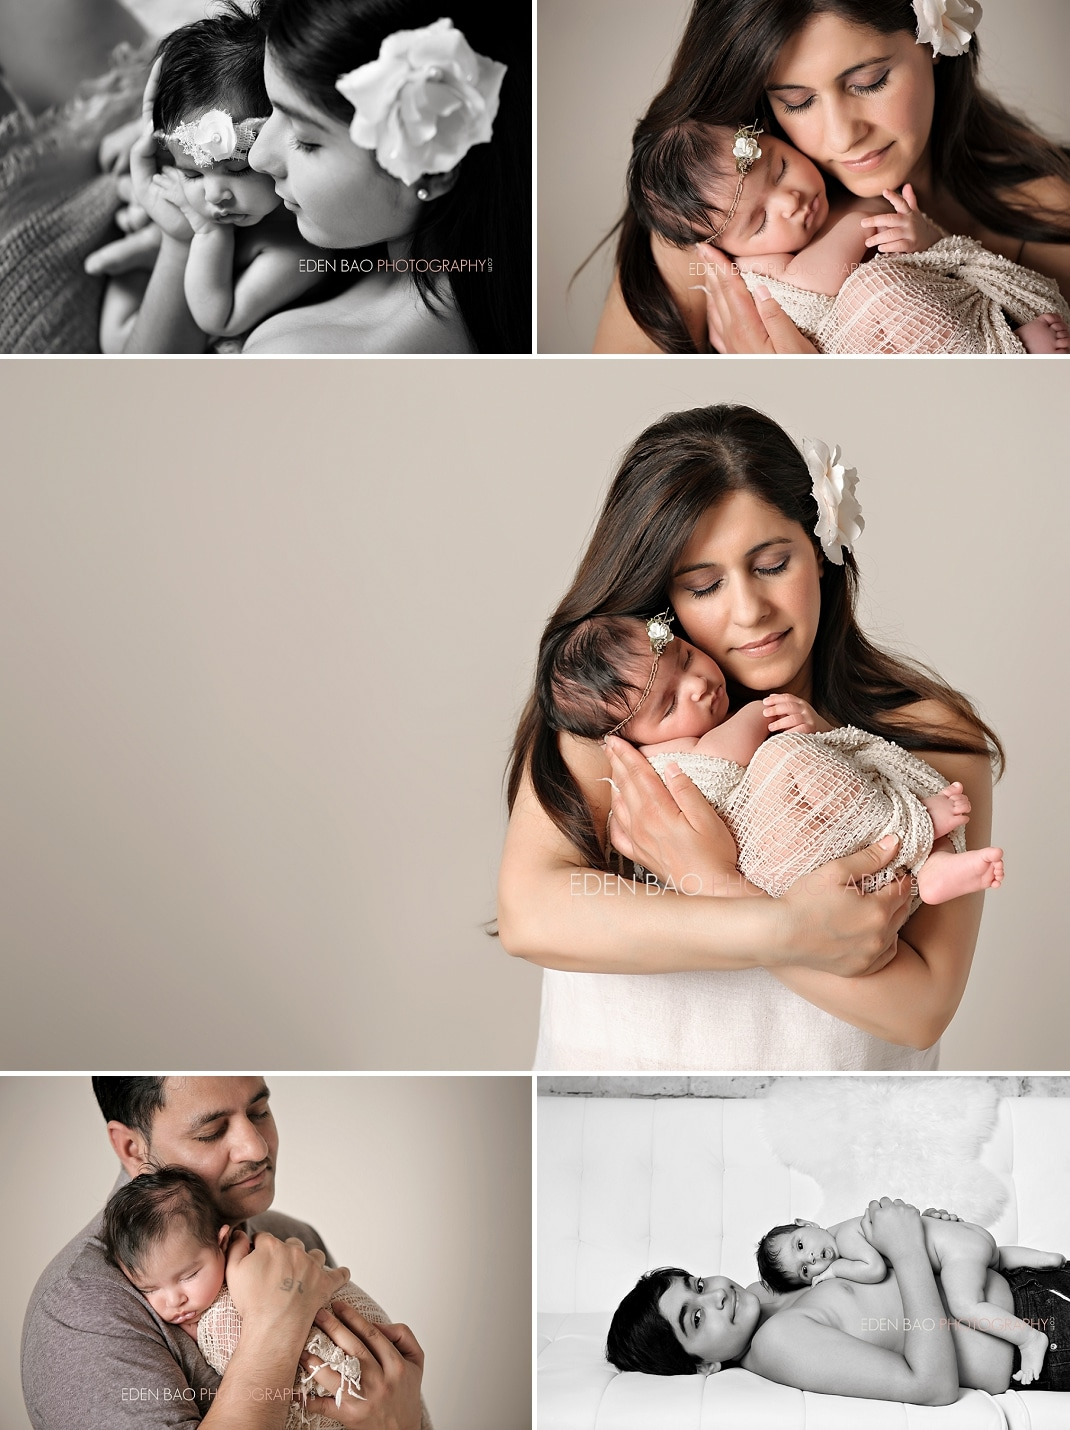 Richmond BC Newborn Photographer Eden Bao | Zara parent baby siblings